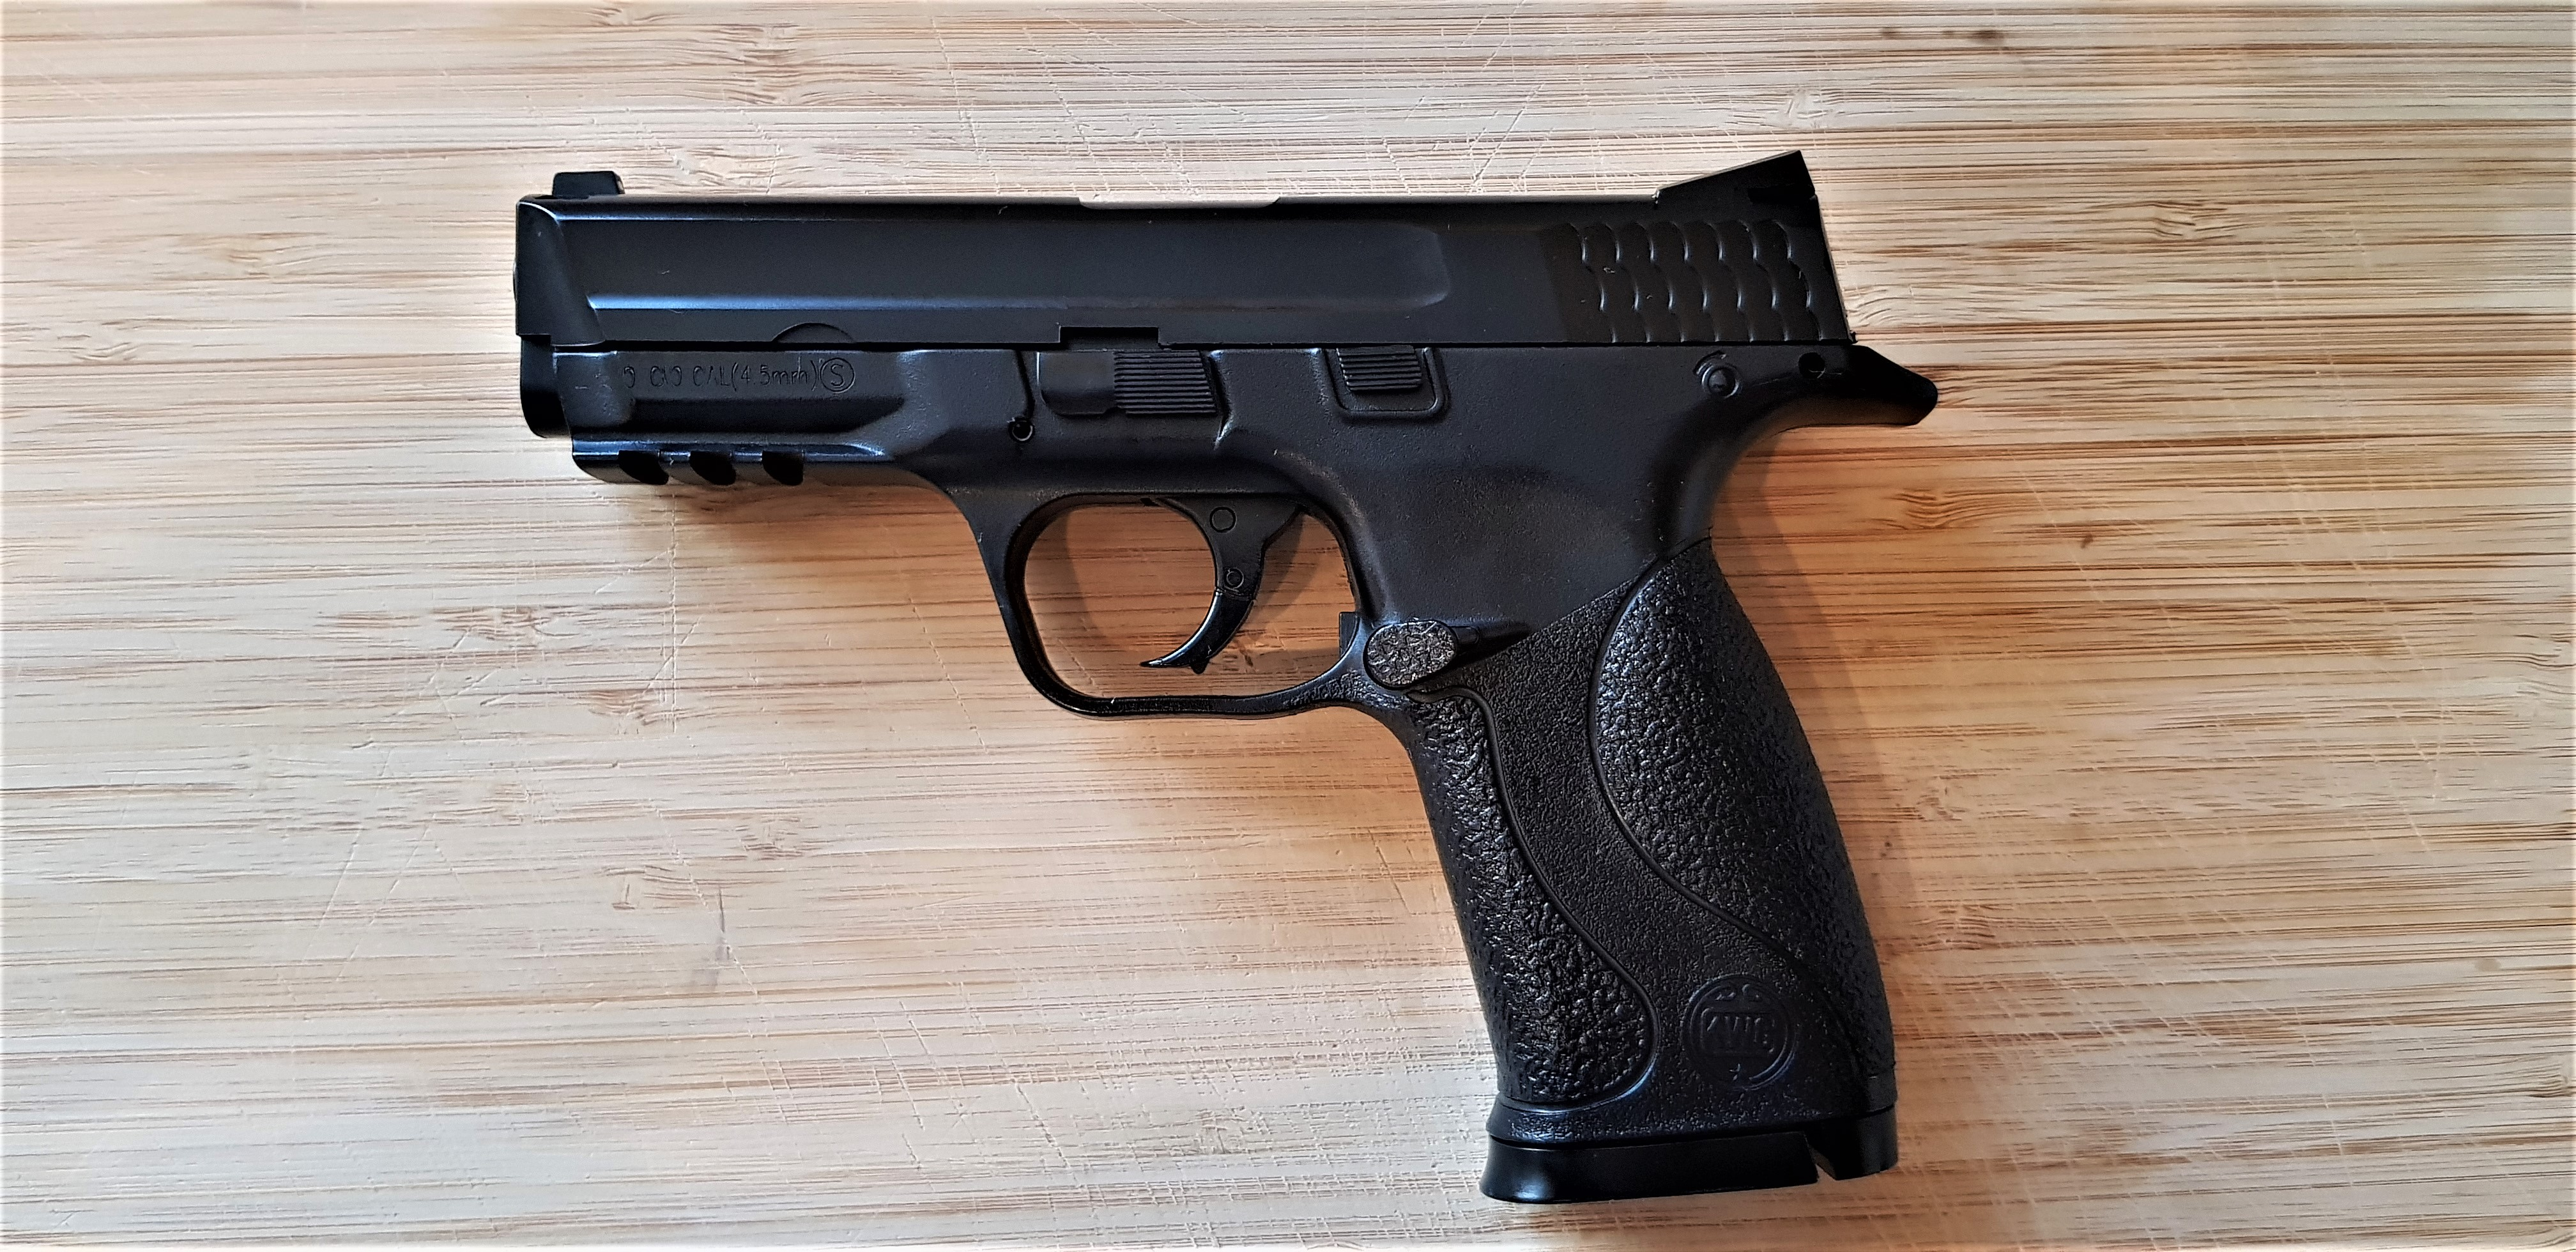 S&W M&P 9 (Prob Pistol)